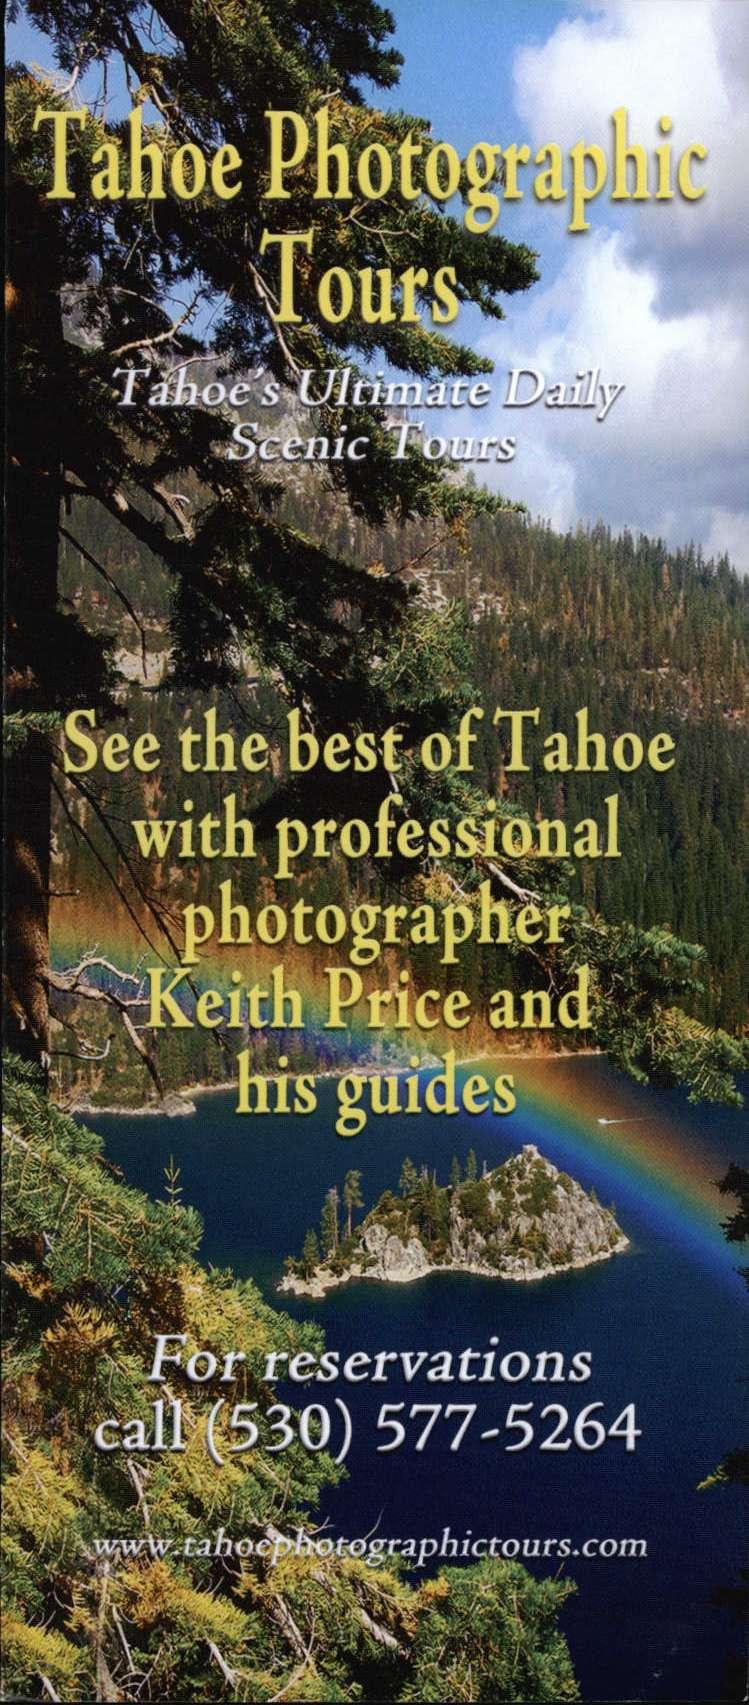 Tahoe Photographic Tours